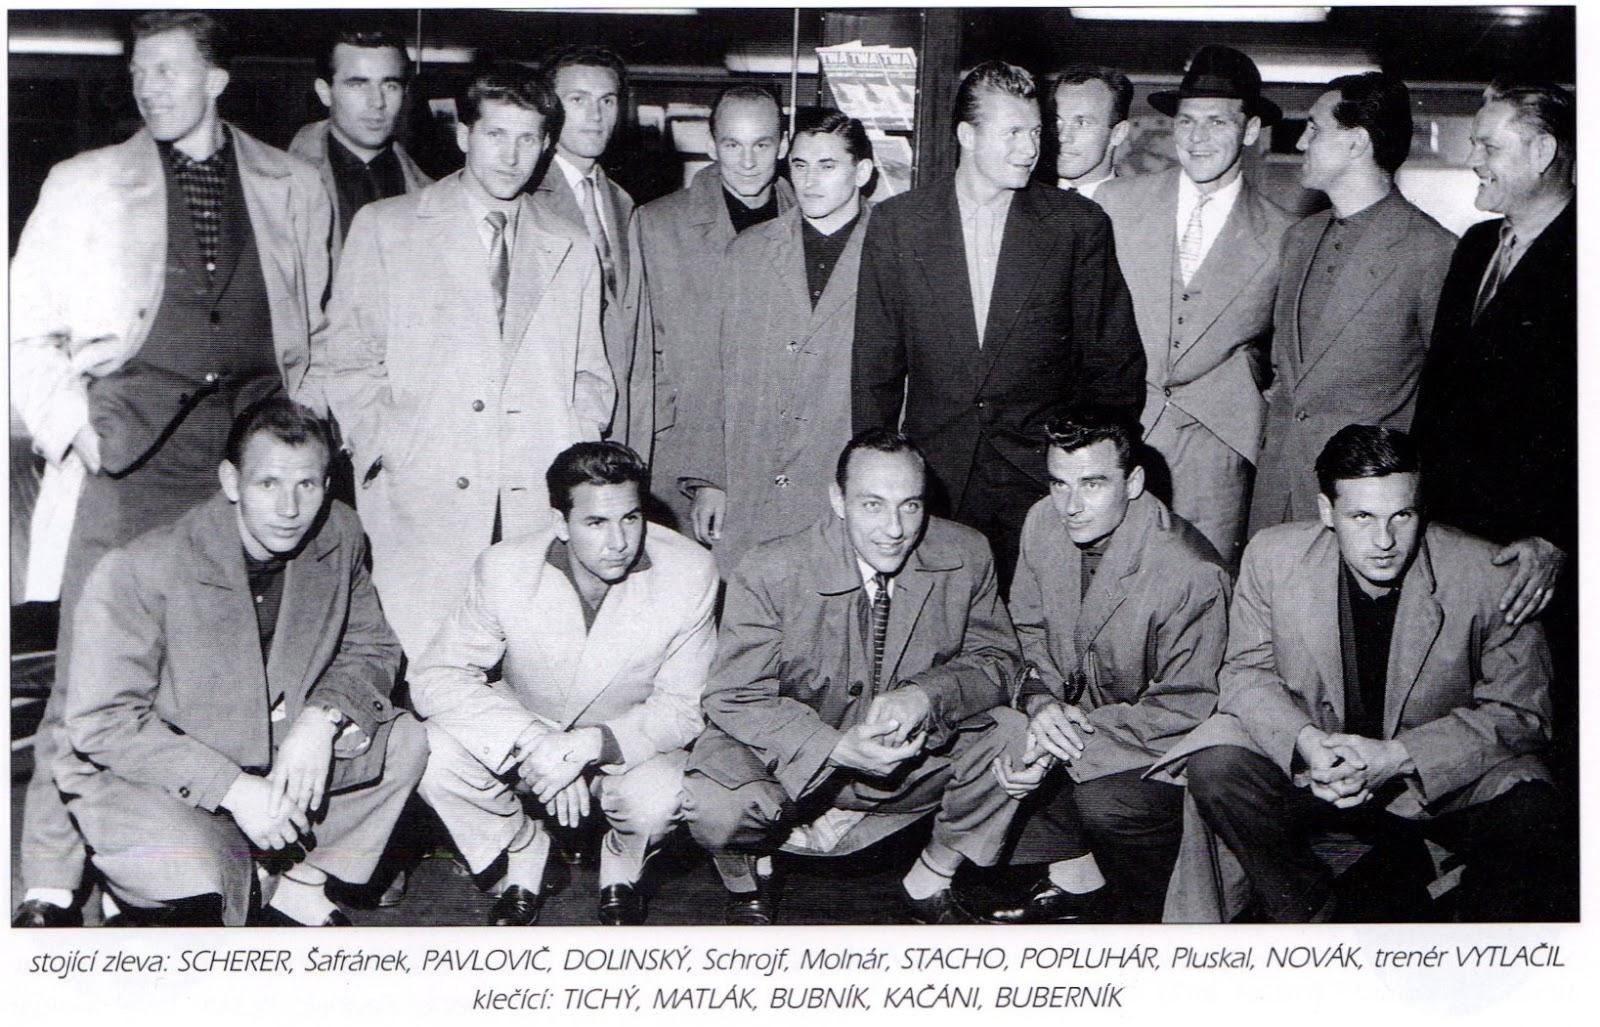 Soccer Nostalgia pendium to the 1960 Euros Qualifiers